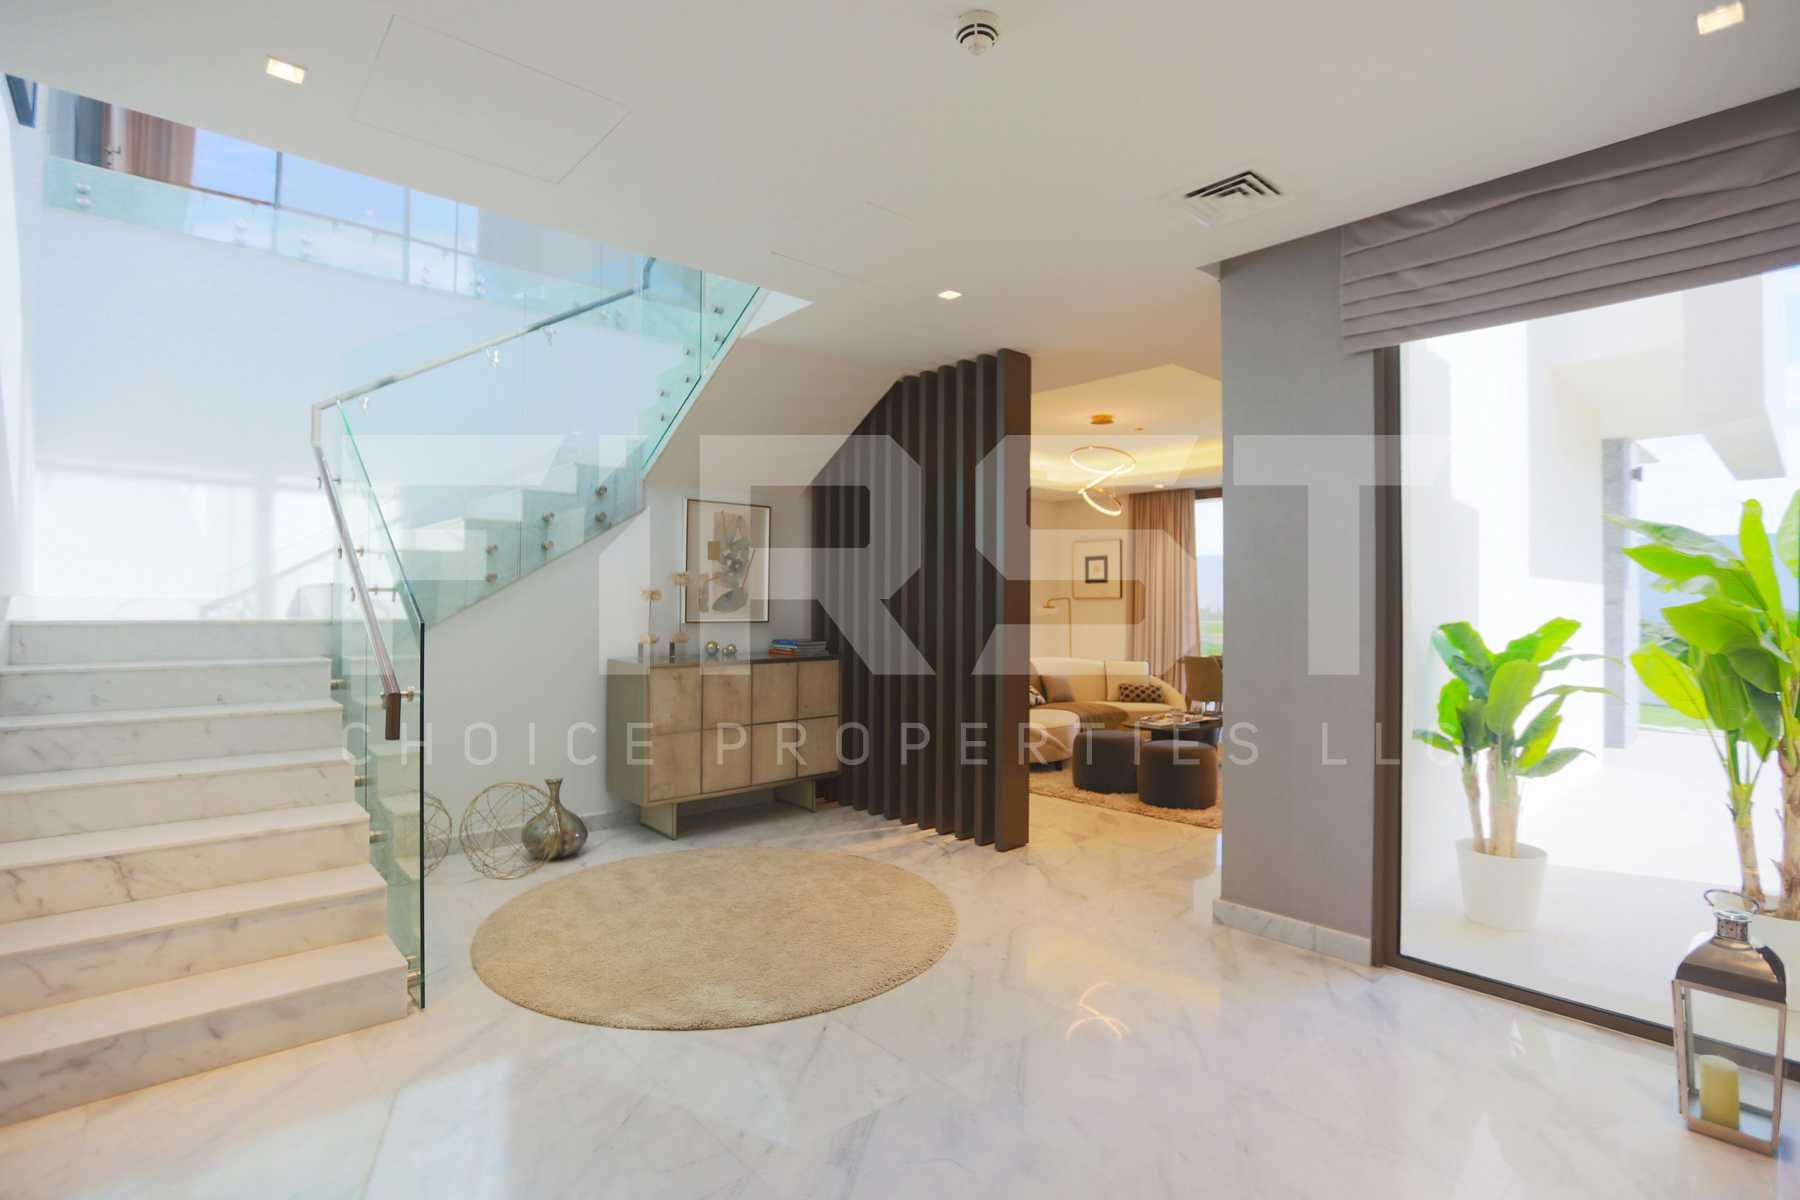 Internal Photo of 4 Bedroom Villa Type 4F in Yas Acres Yas Island Abu Dhabi UAE (1).jpg